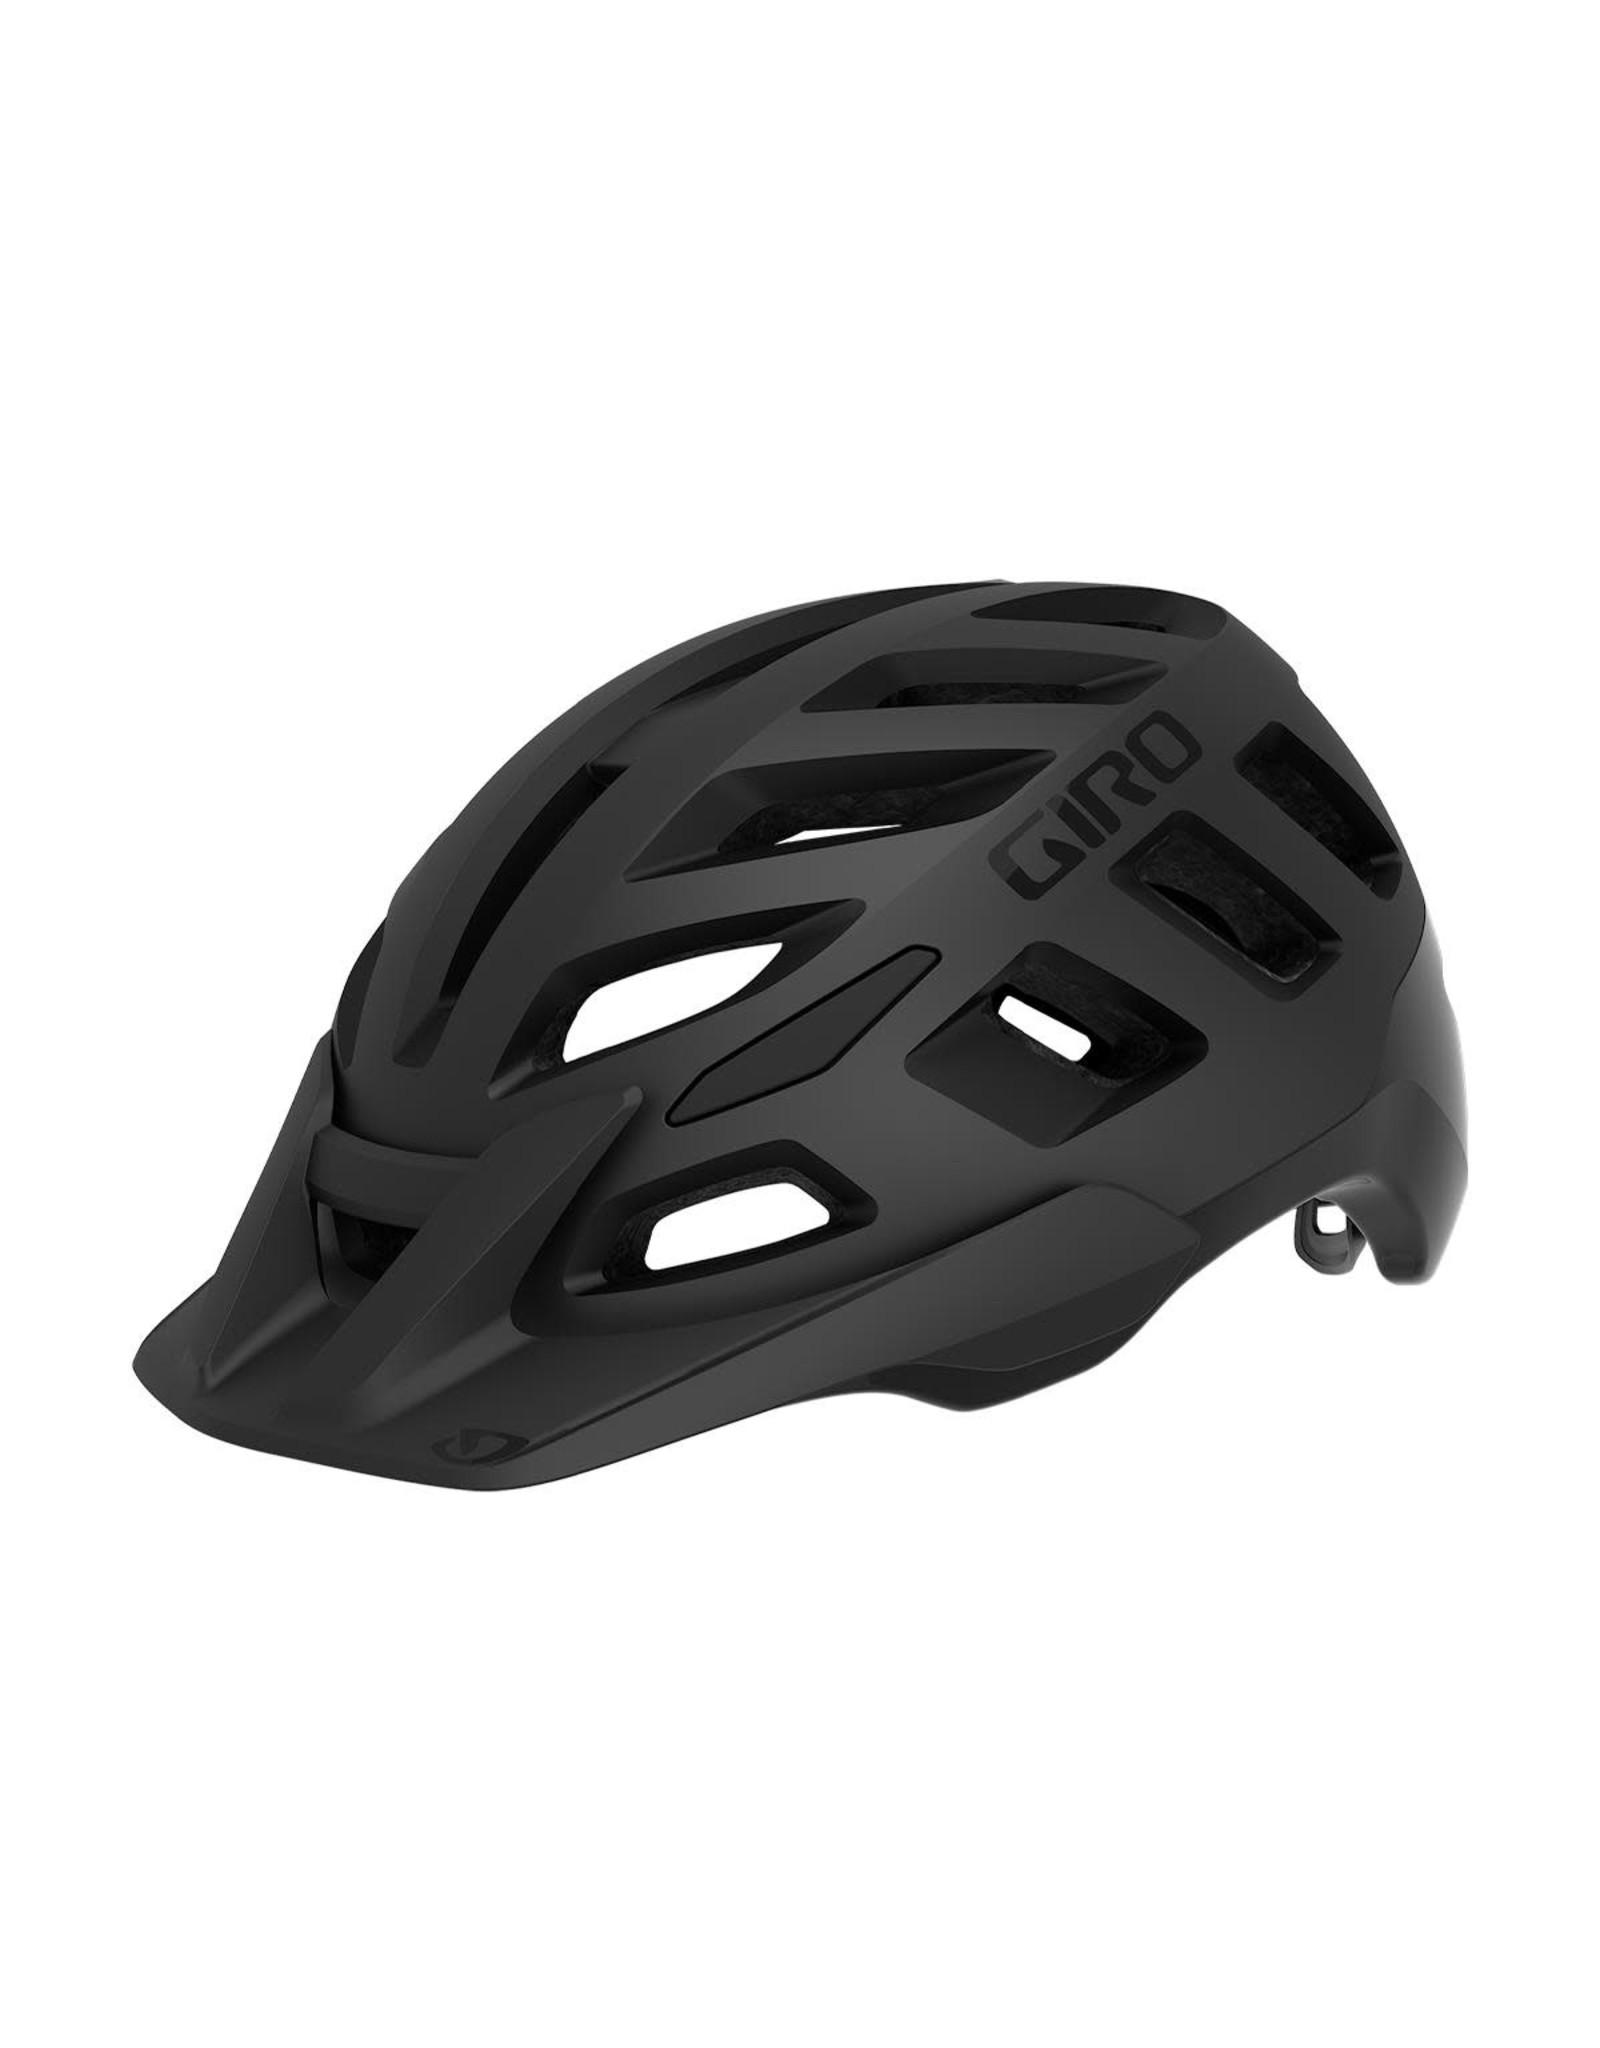 Giro Giro Radix Dirt Helmet 2020: Matte Black S 51-55Cm